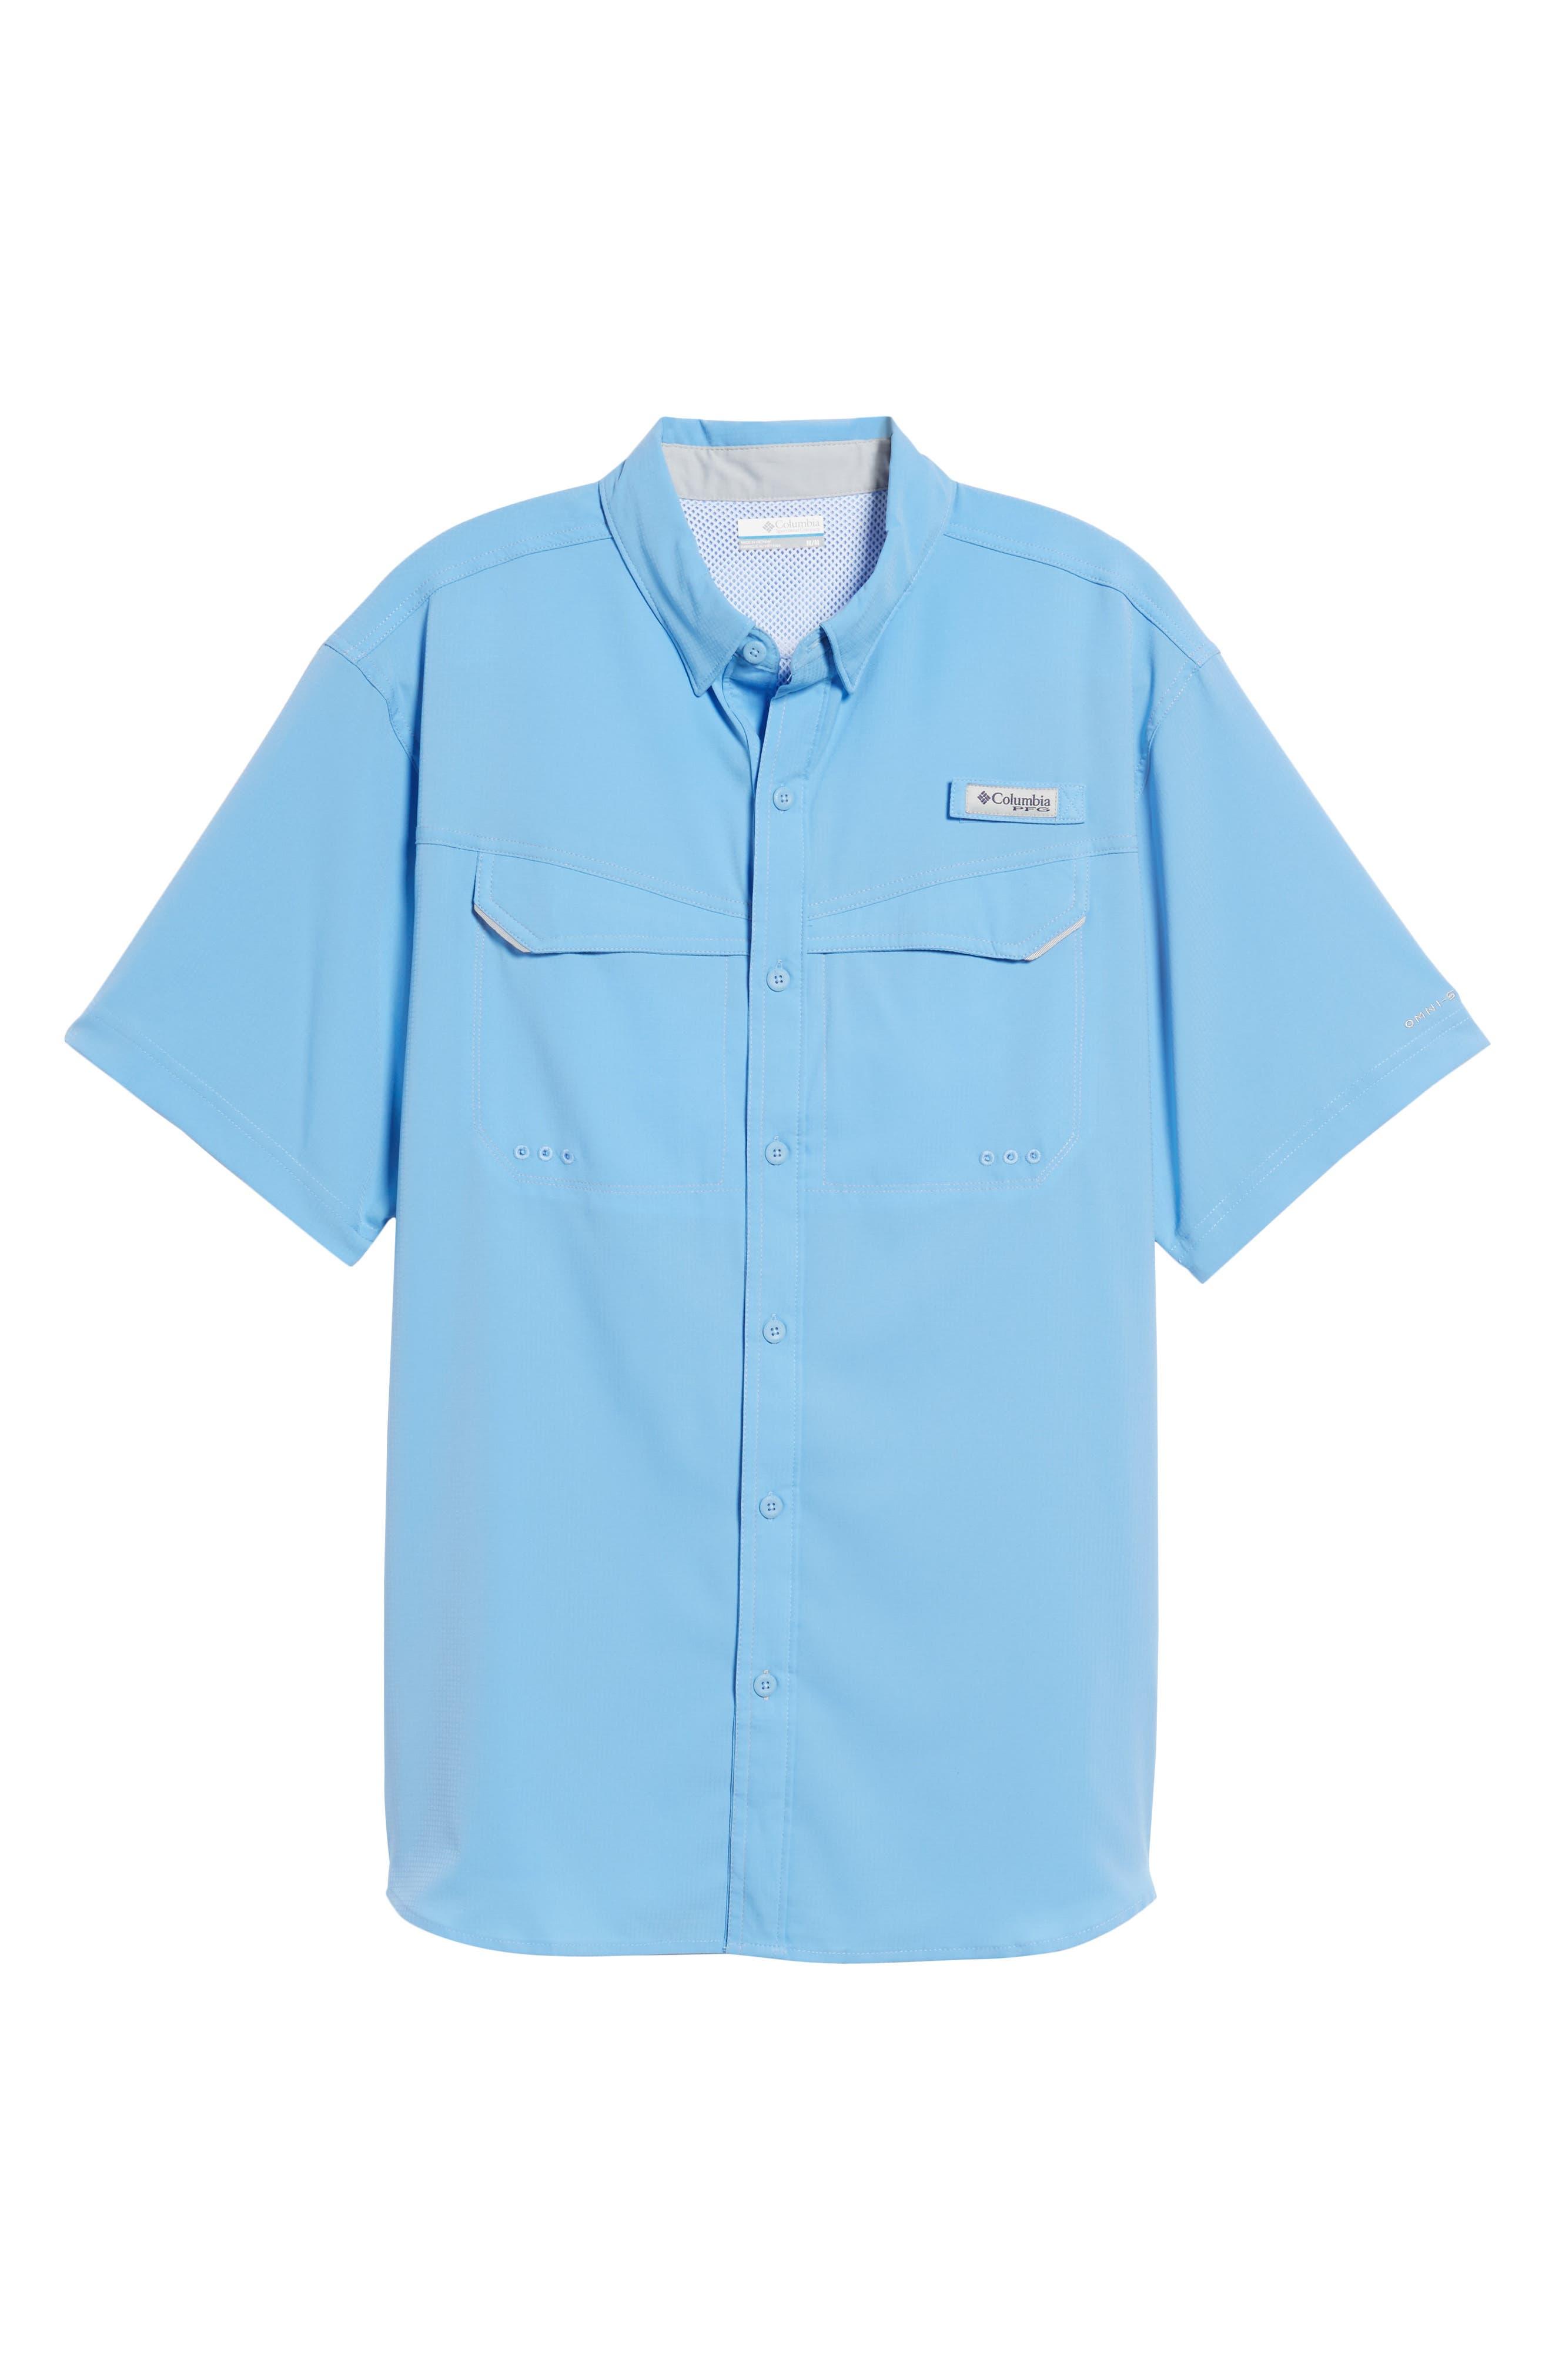 PFG Low Drag Offshore Woven Shirt,                             Alternate thumbnail 6, color,                             150